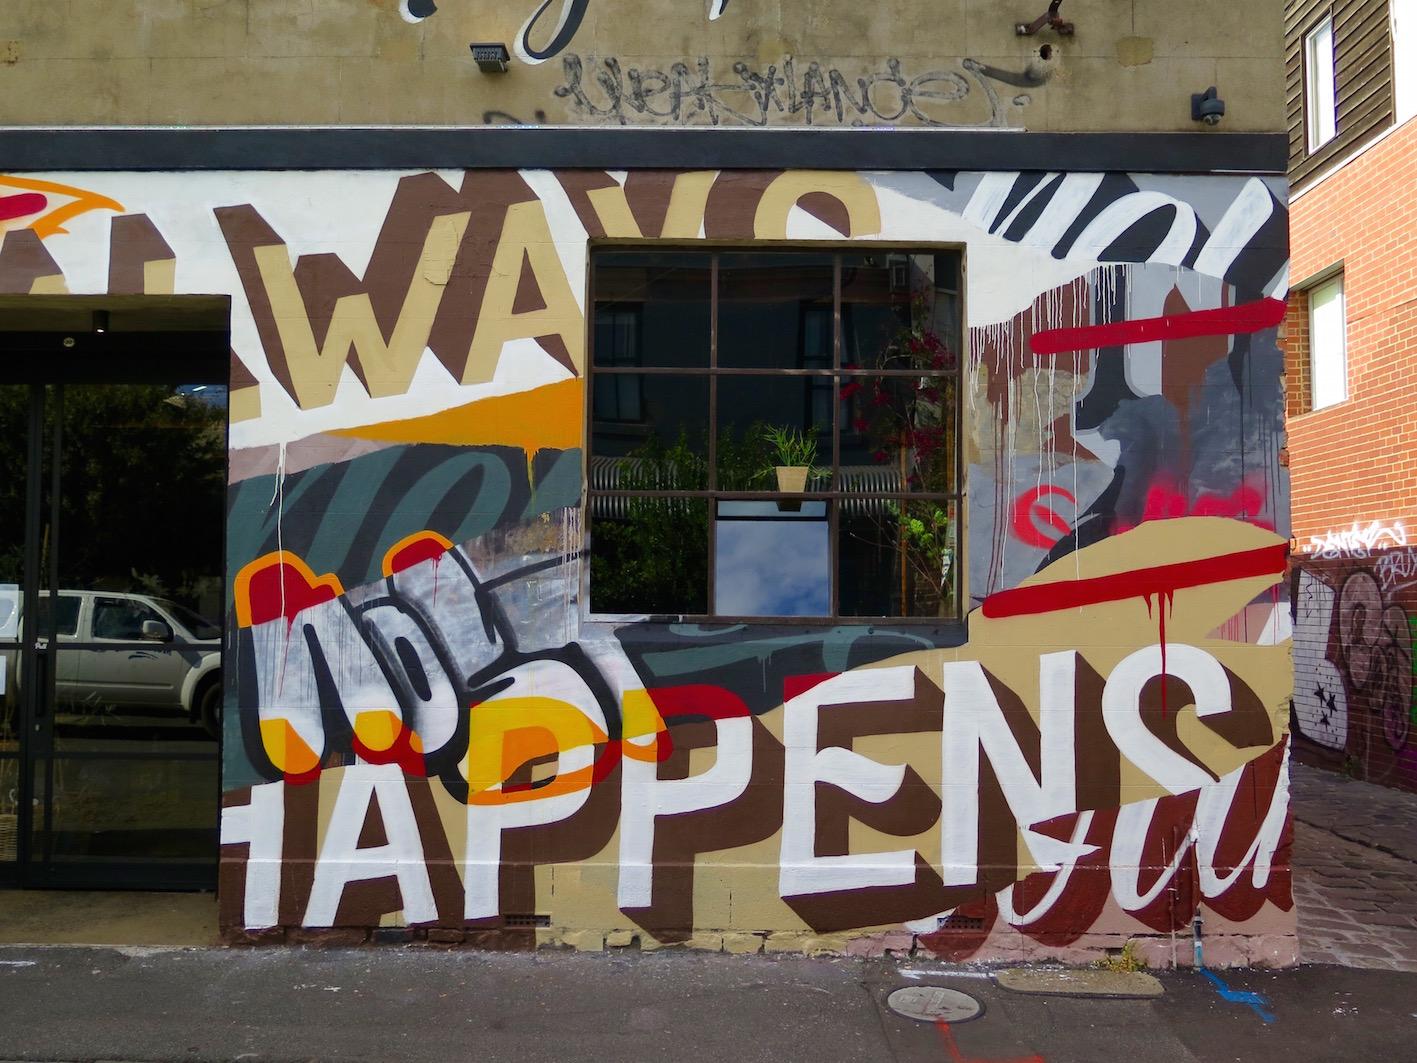 deansunshine_landofsunshine_melbourne_streetart_graffiti_never satisfied transformer 3